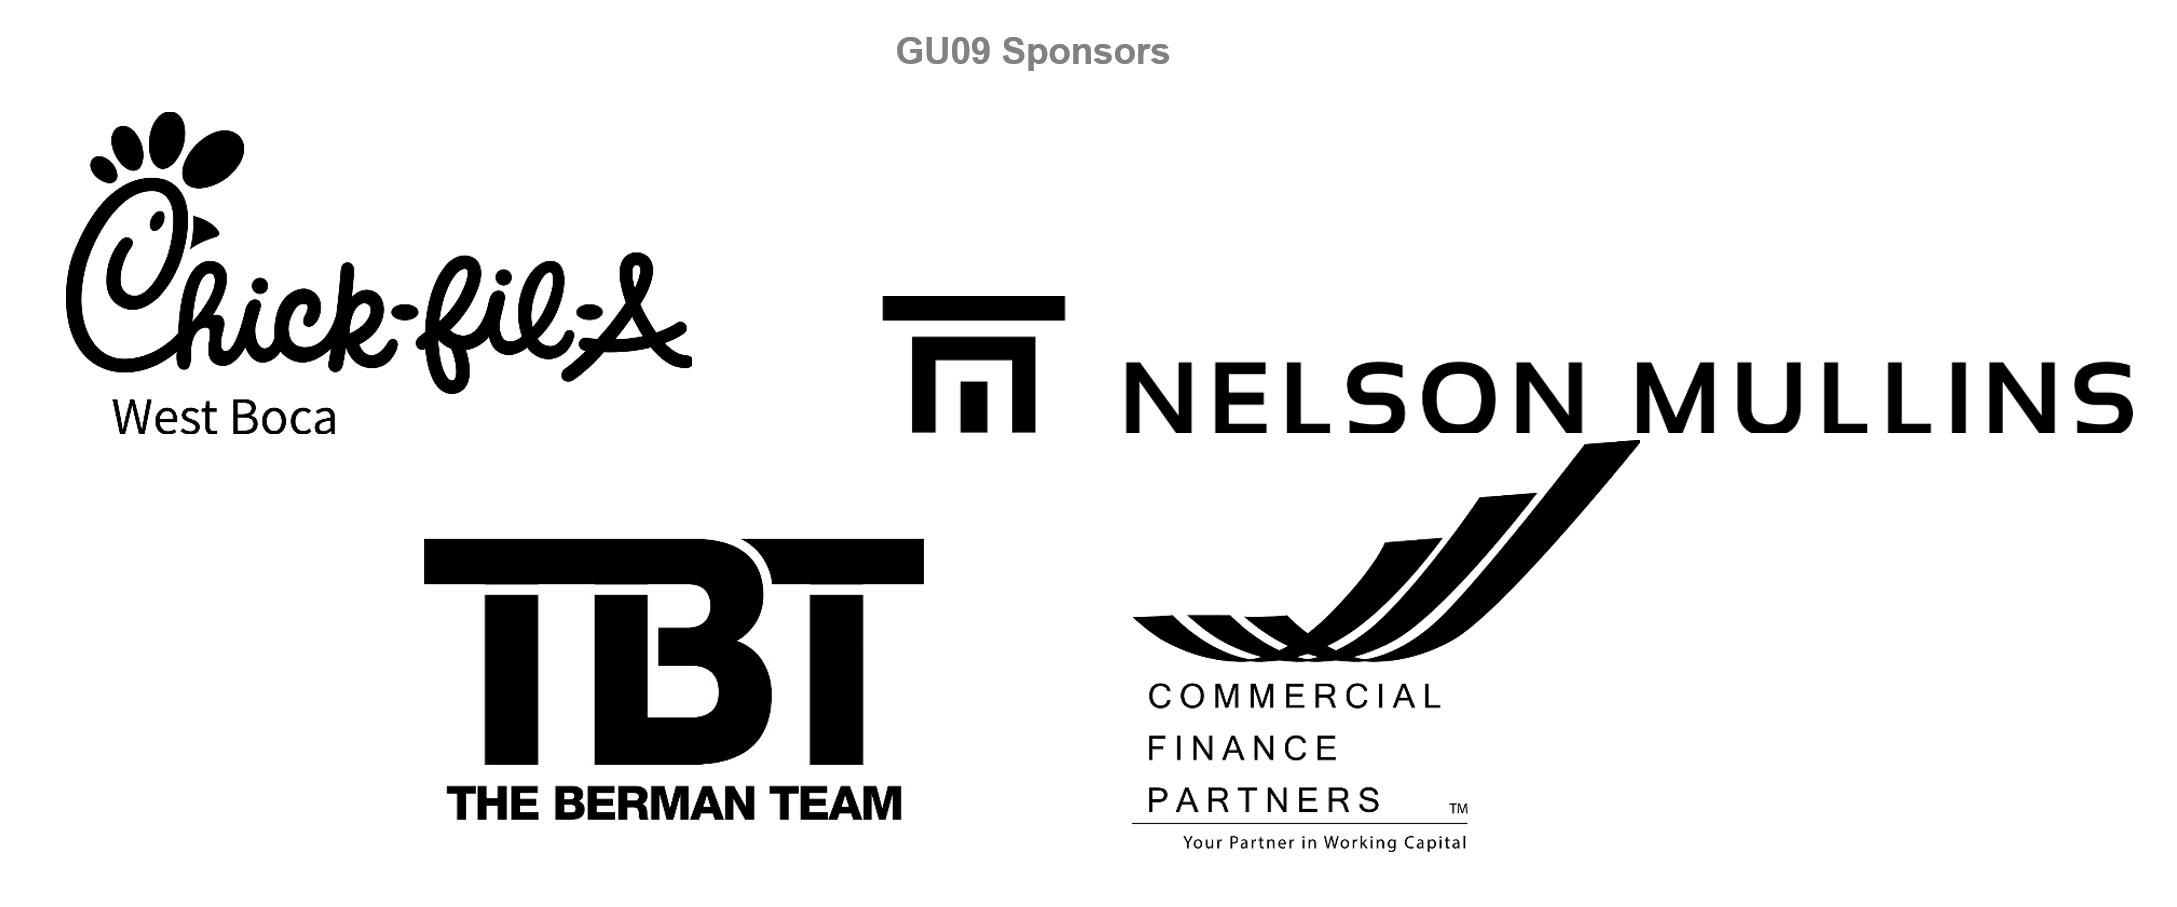 GU09_Sponsors2020